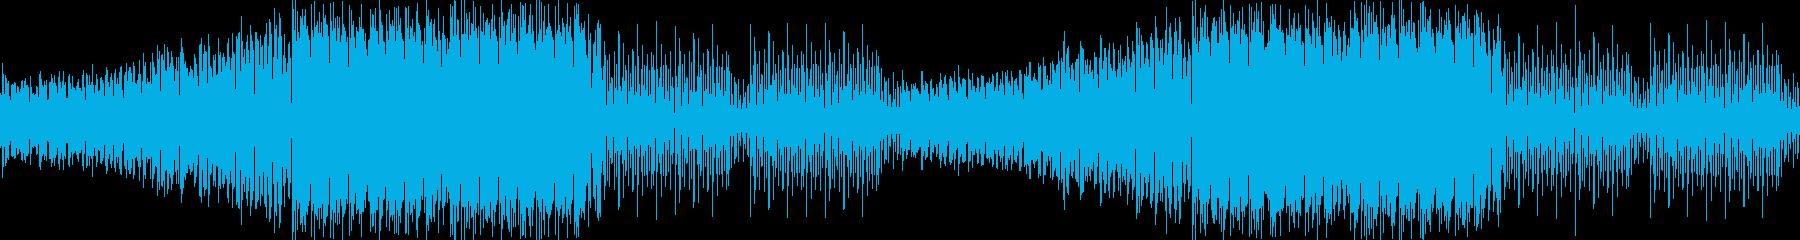 Sports/EDM/refreshing/bright's reproduced waveform